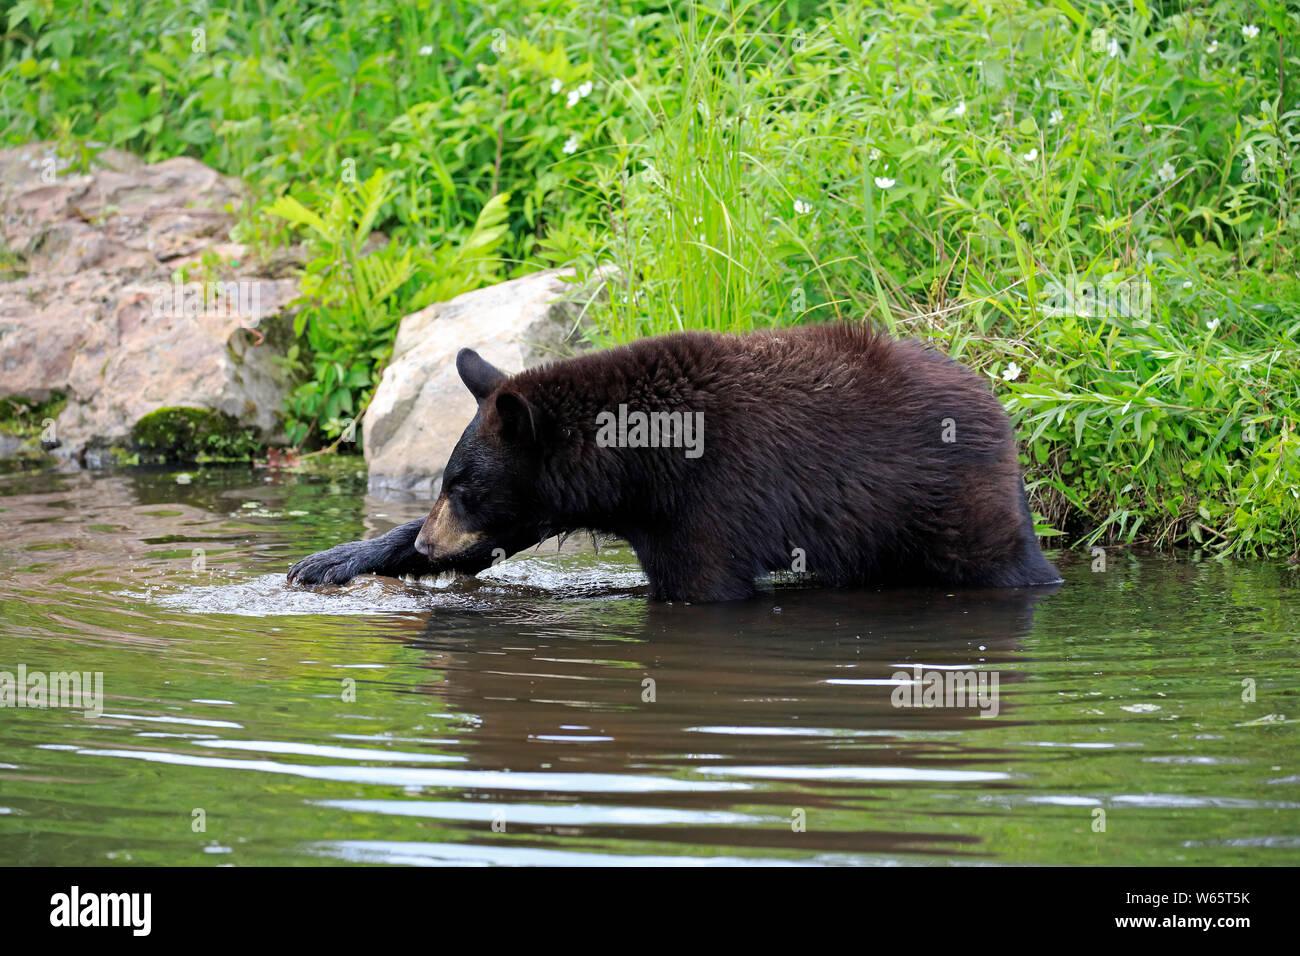 Black Bear, young at water, Pine County, Minnesota, USA, North America, (Ursus americanus) Stock Photo